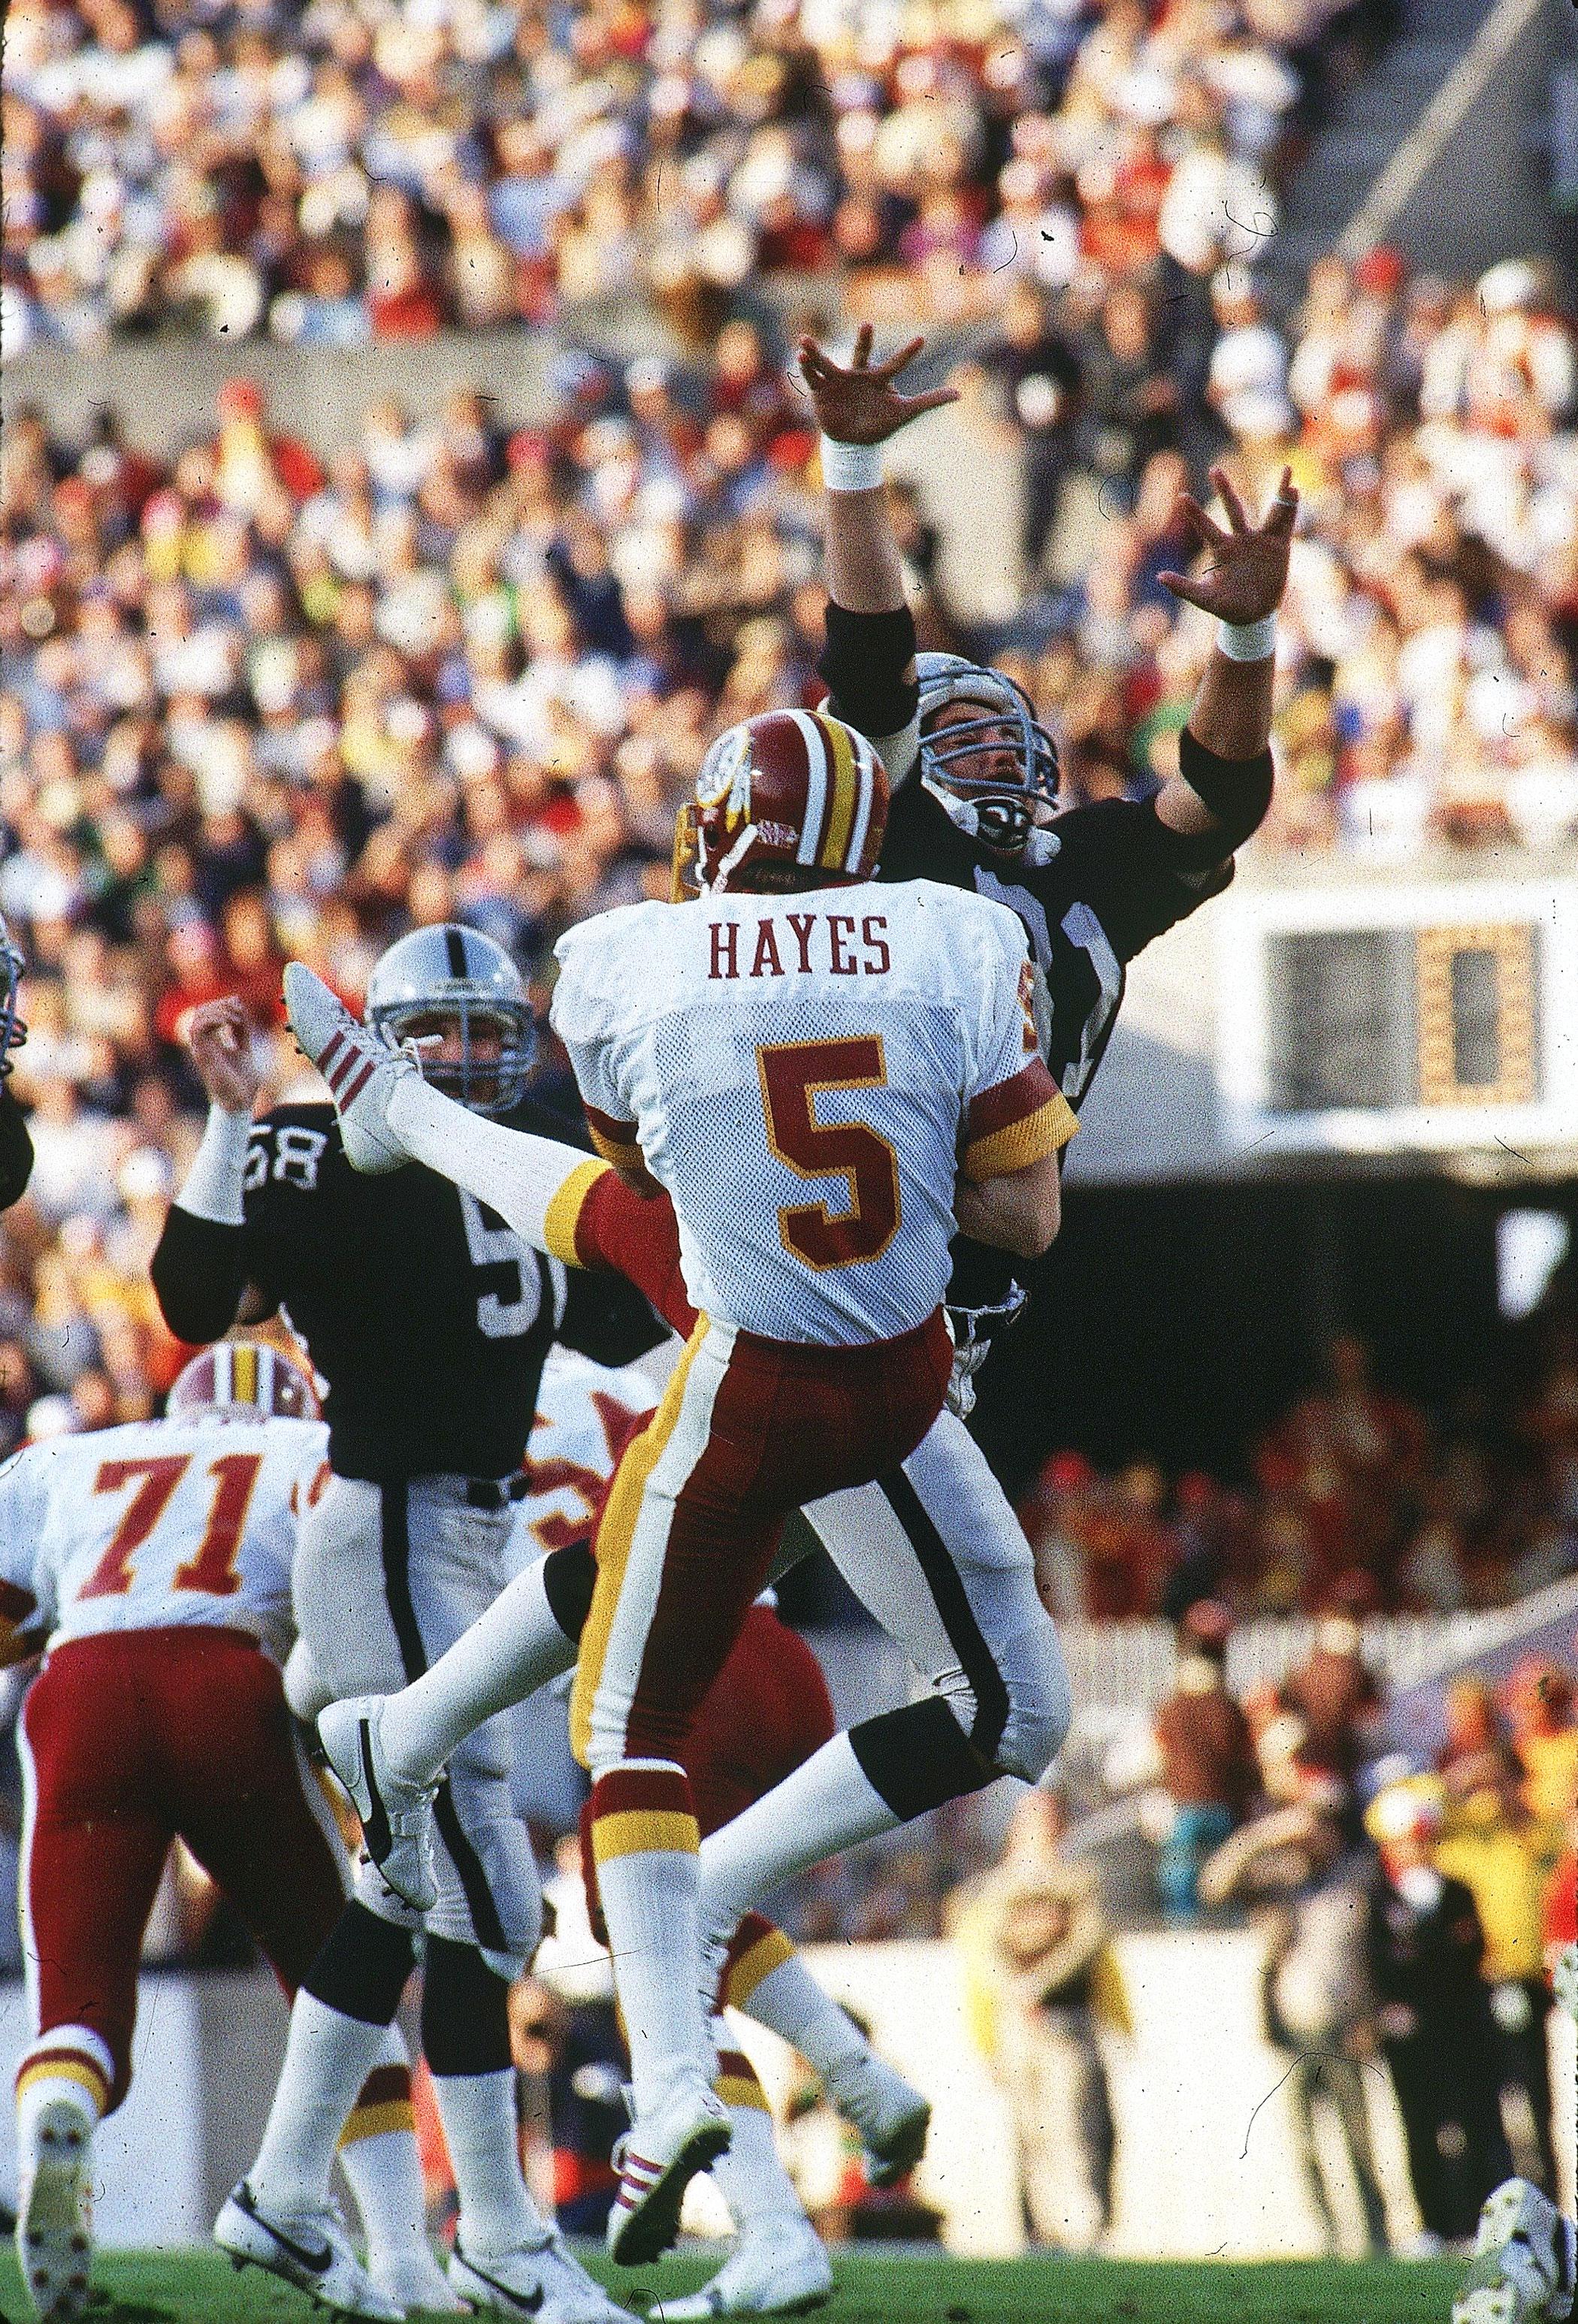 Super Bowl XVIII, Jan. 22, 1984                               Los Angeles Raiders vs Washington Redskins in Tampa, Fla.